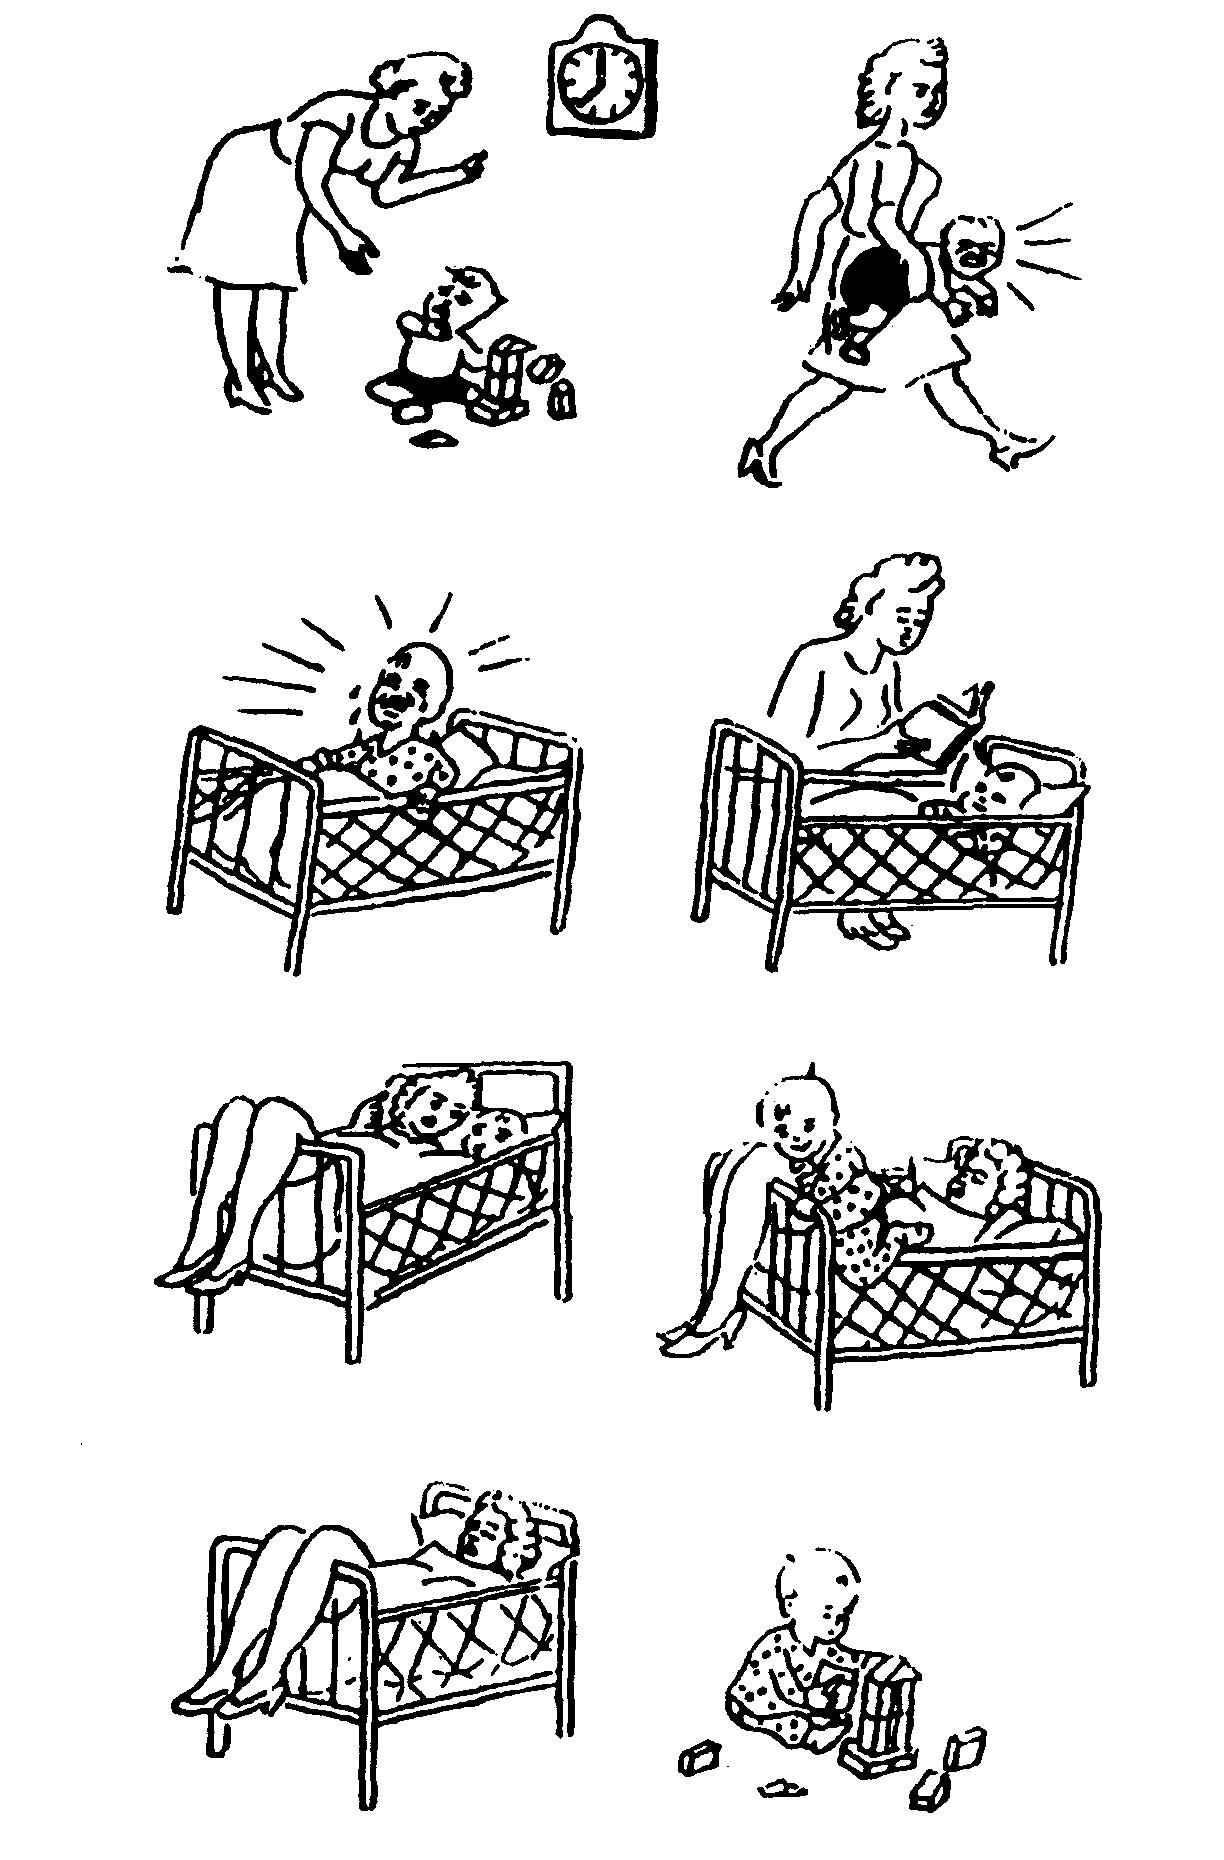 Методика развития по картинками